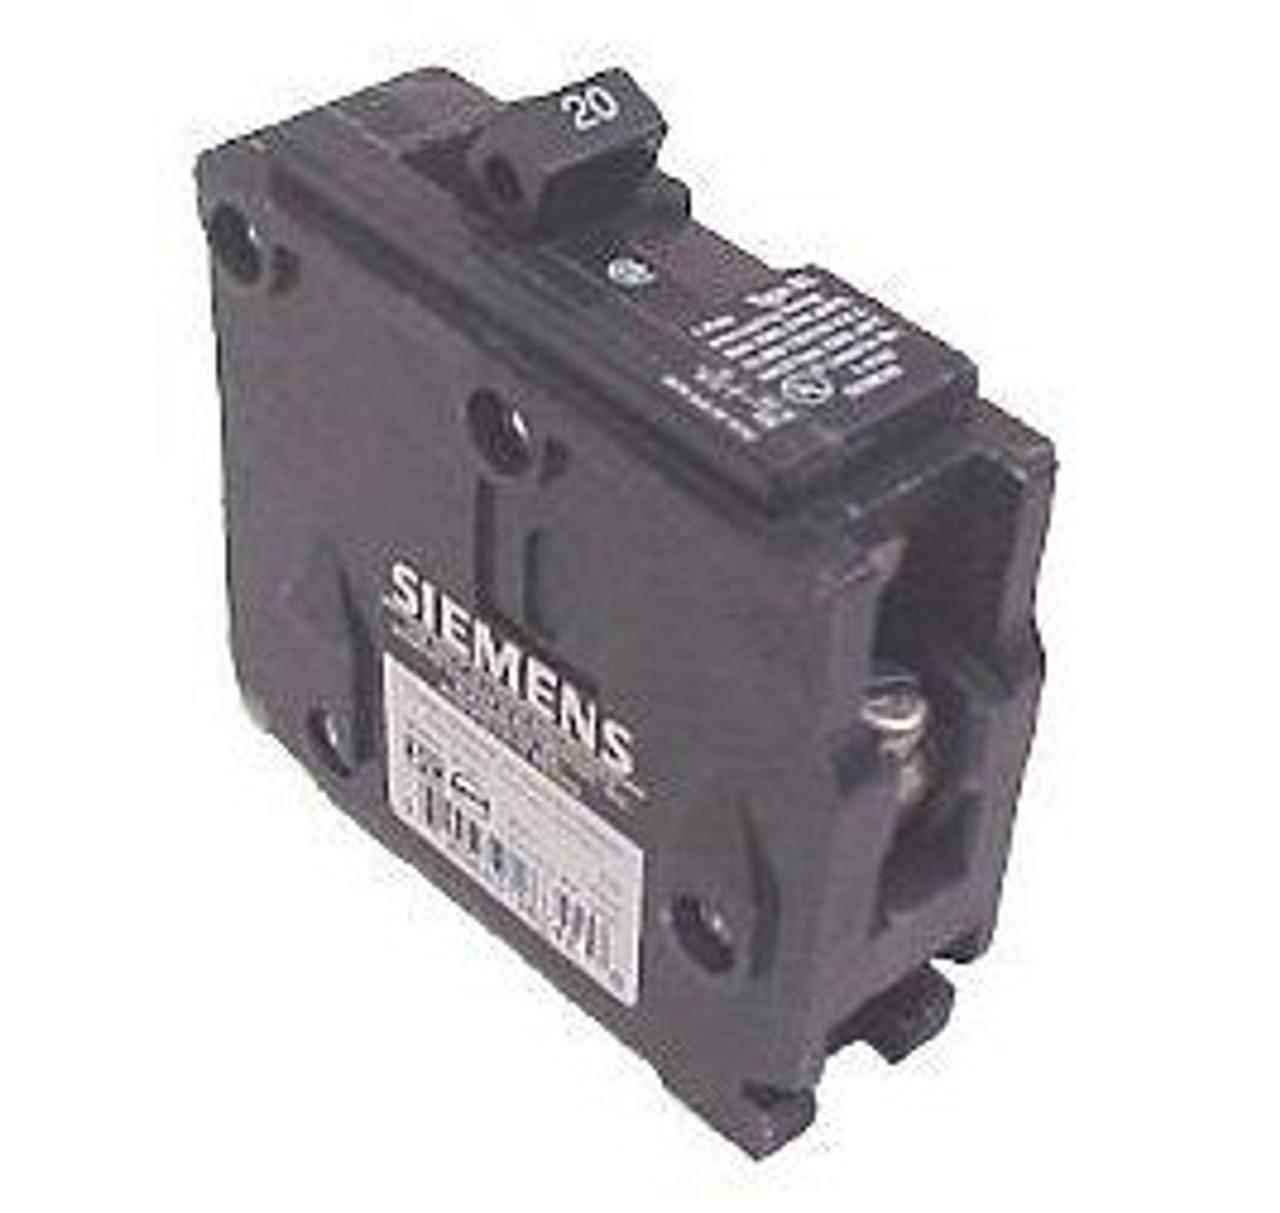 Siemens B120 1 Pole 20 Amp 120VAC Type BL Circuit Breaker - NPO